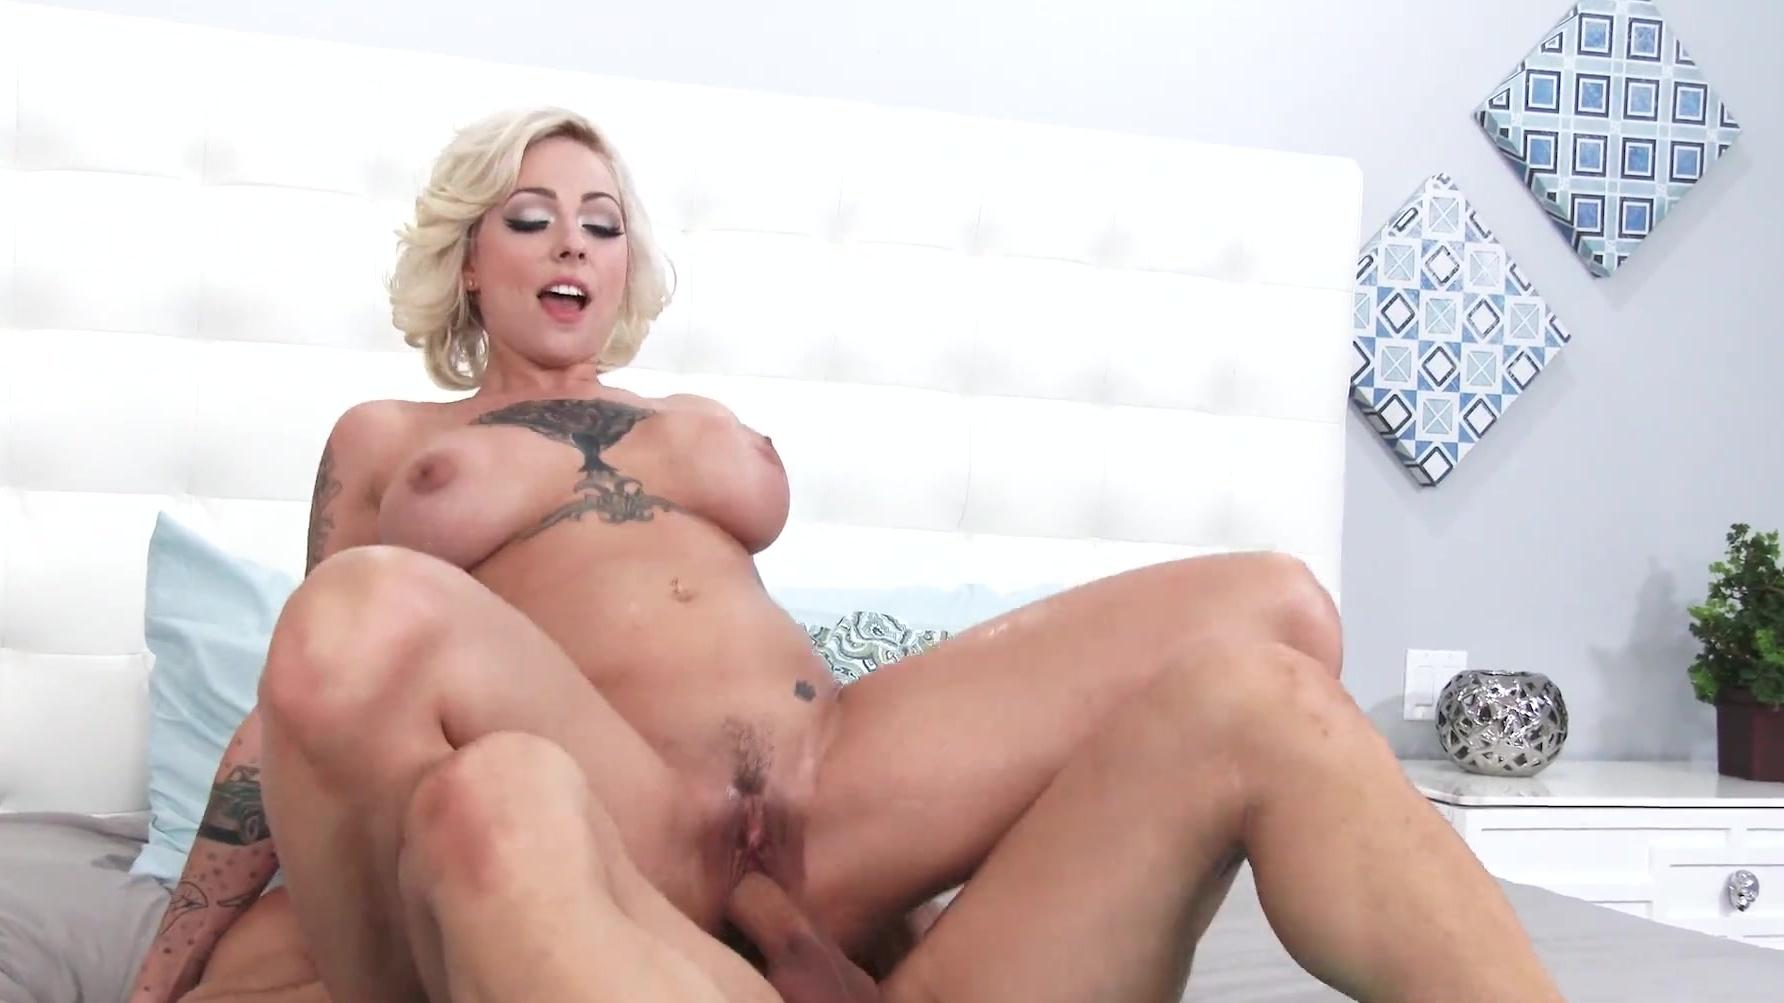 down-fucking-cum-ninja-nude-sex